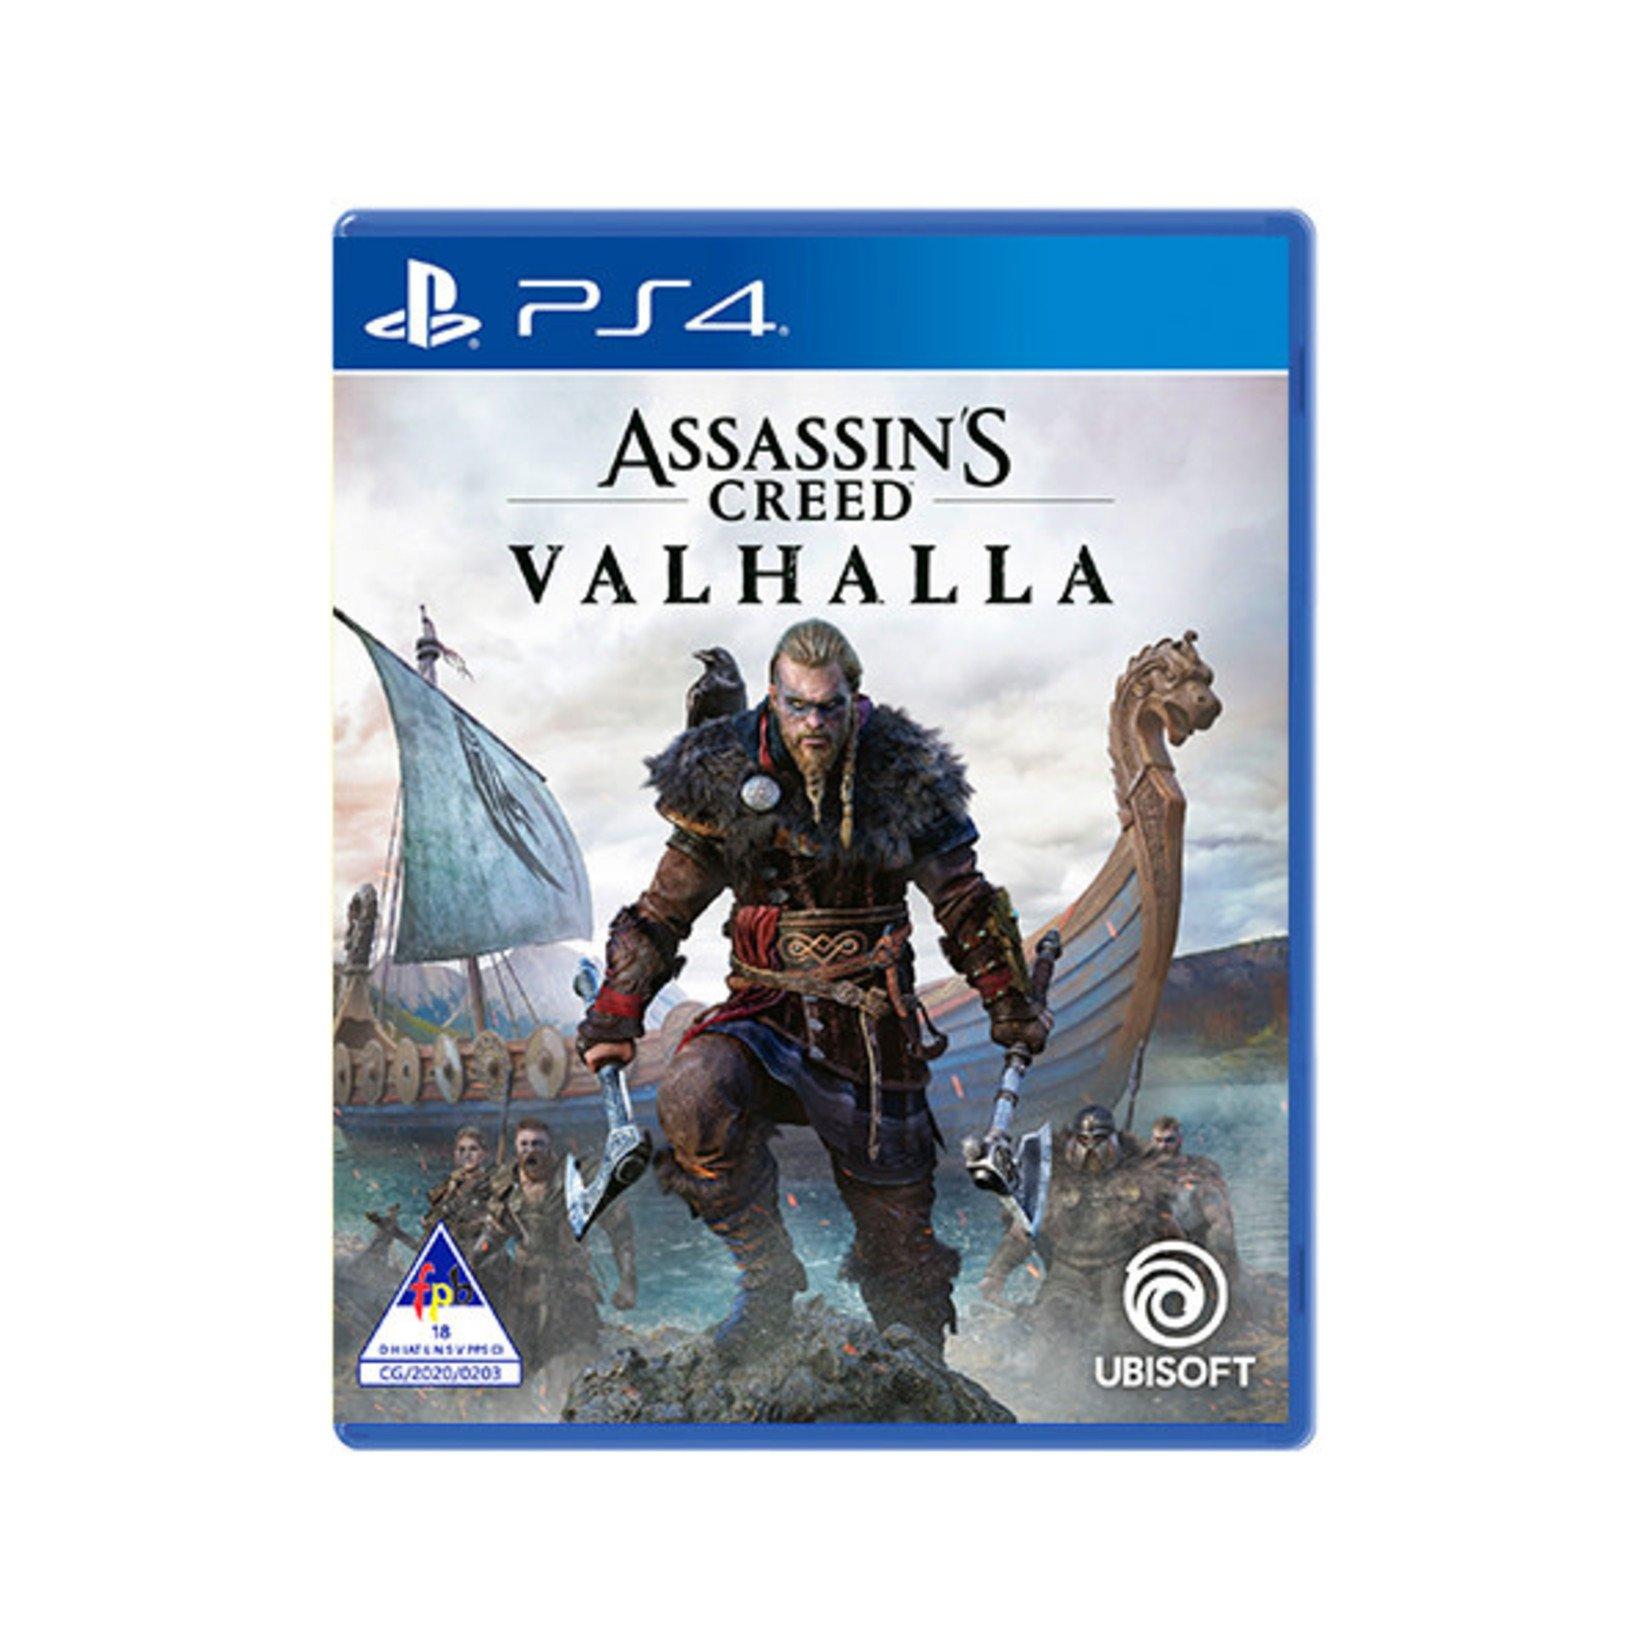 PS4-Assassin's Creed Valhalla